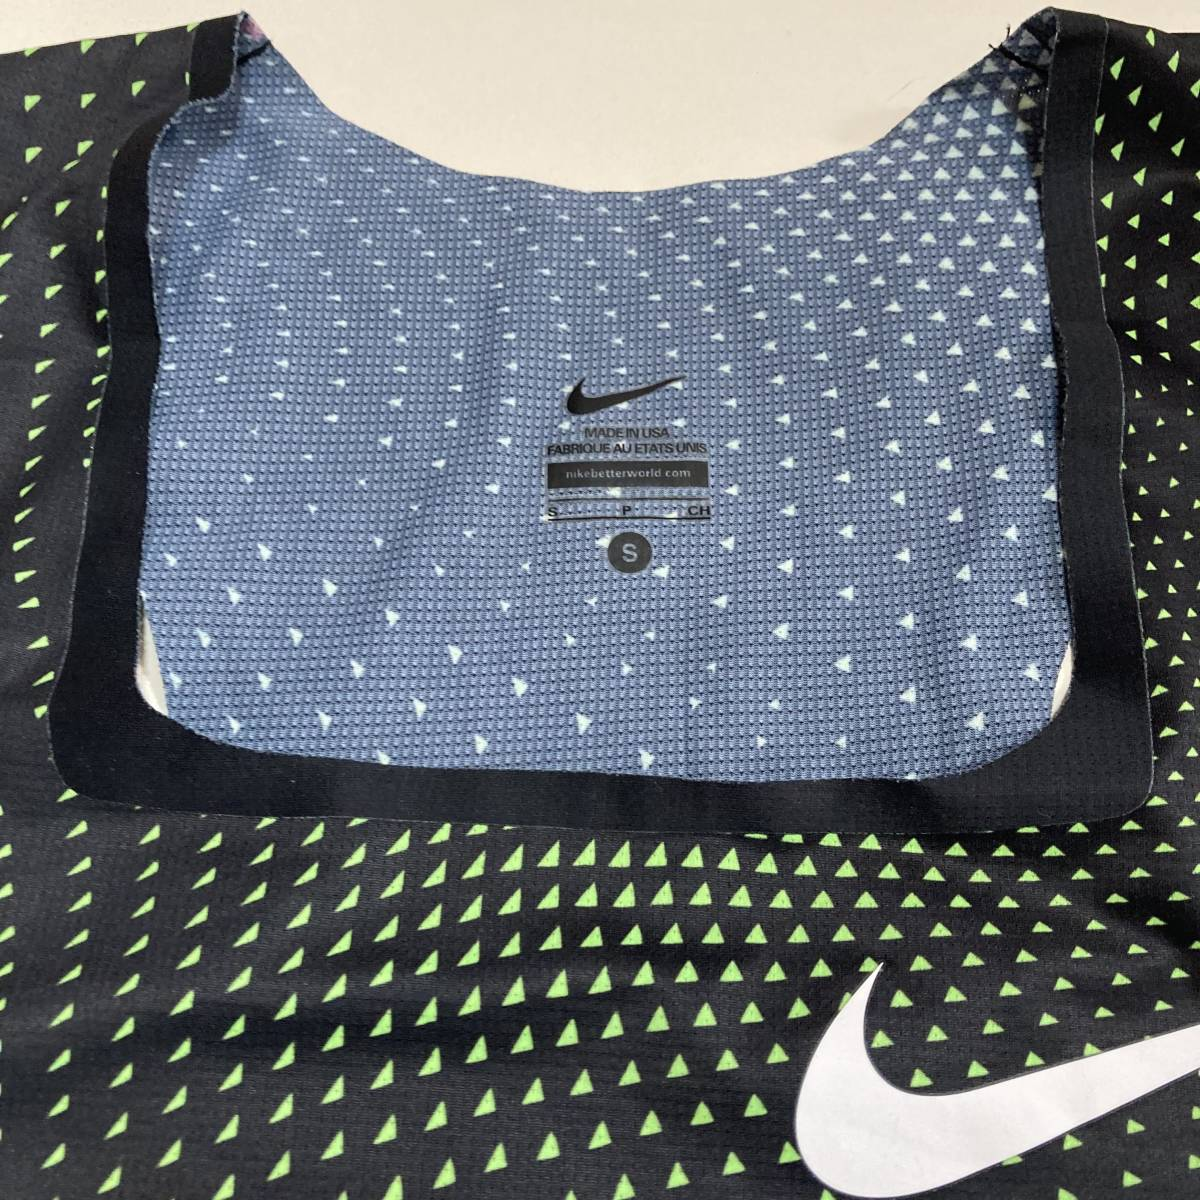 【Sサイズ】Nike ProElite Distance Singlet(2018)【NIKE Pro Elite】